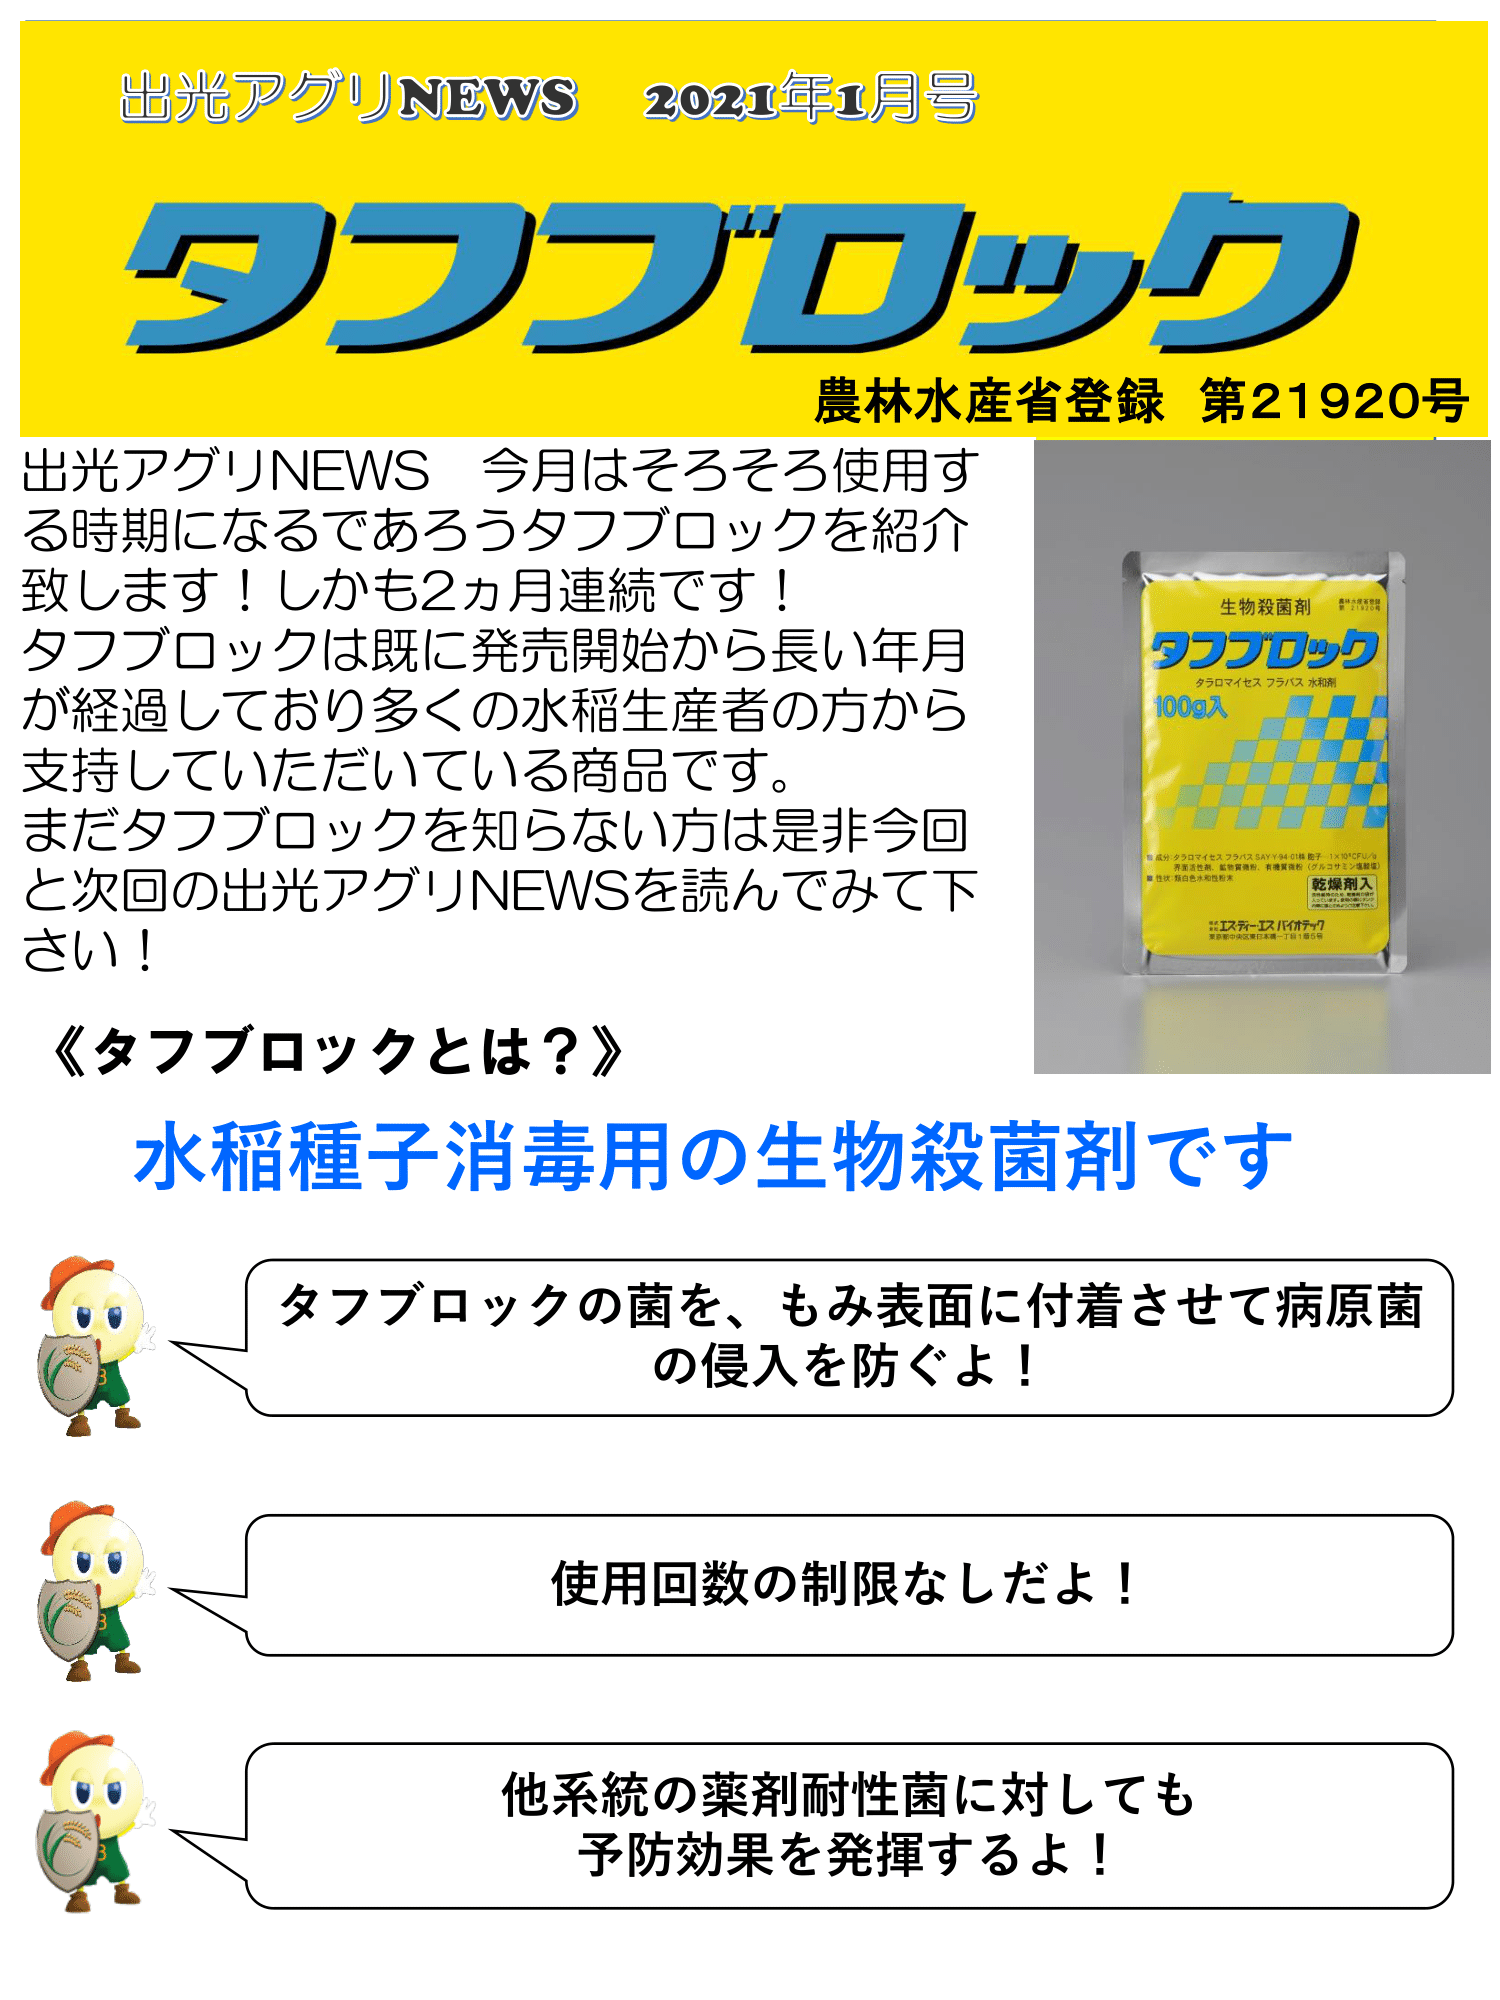 news_2011